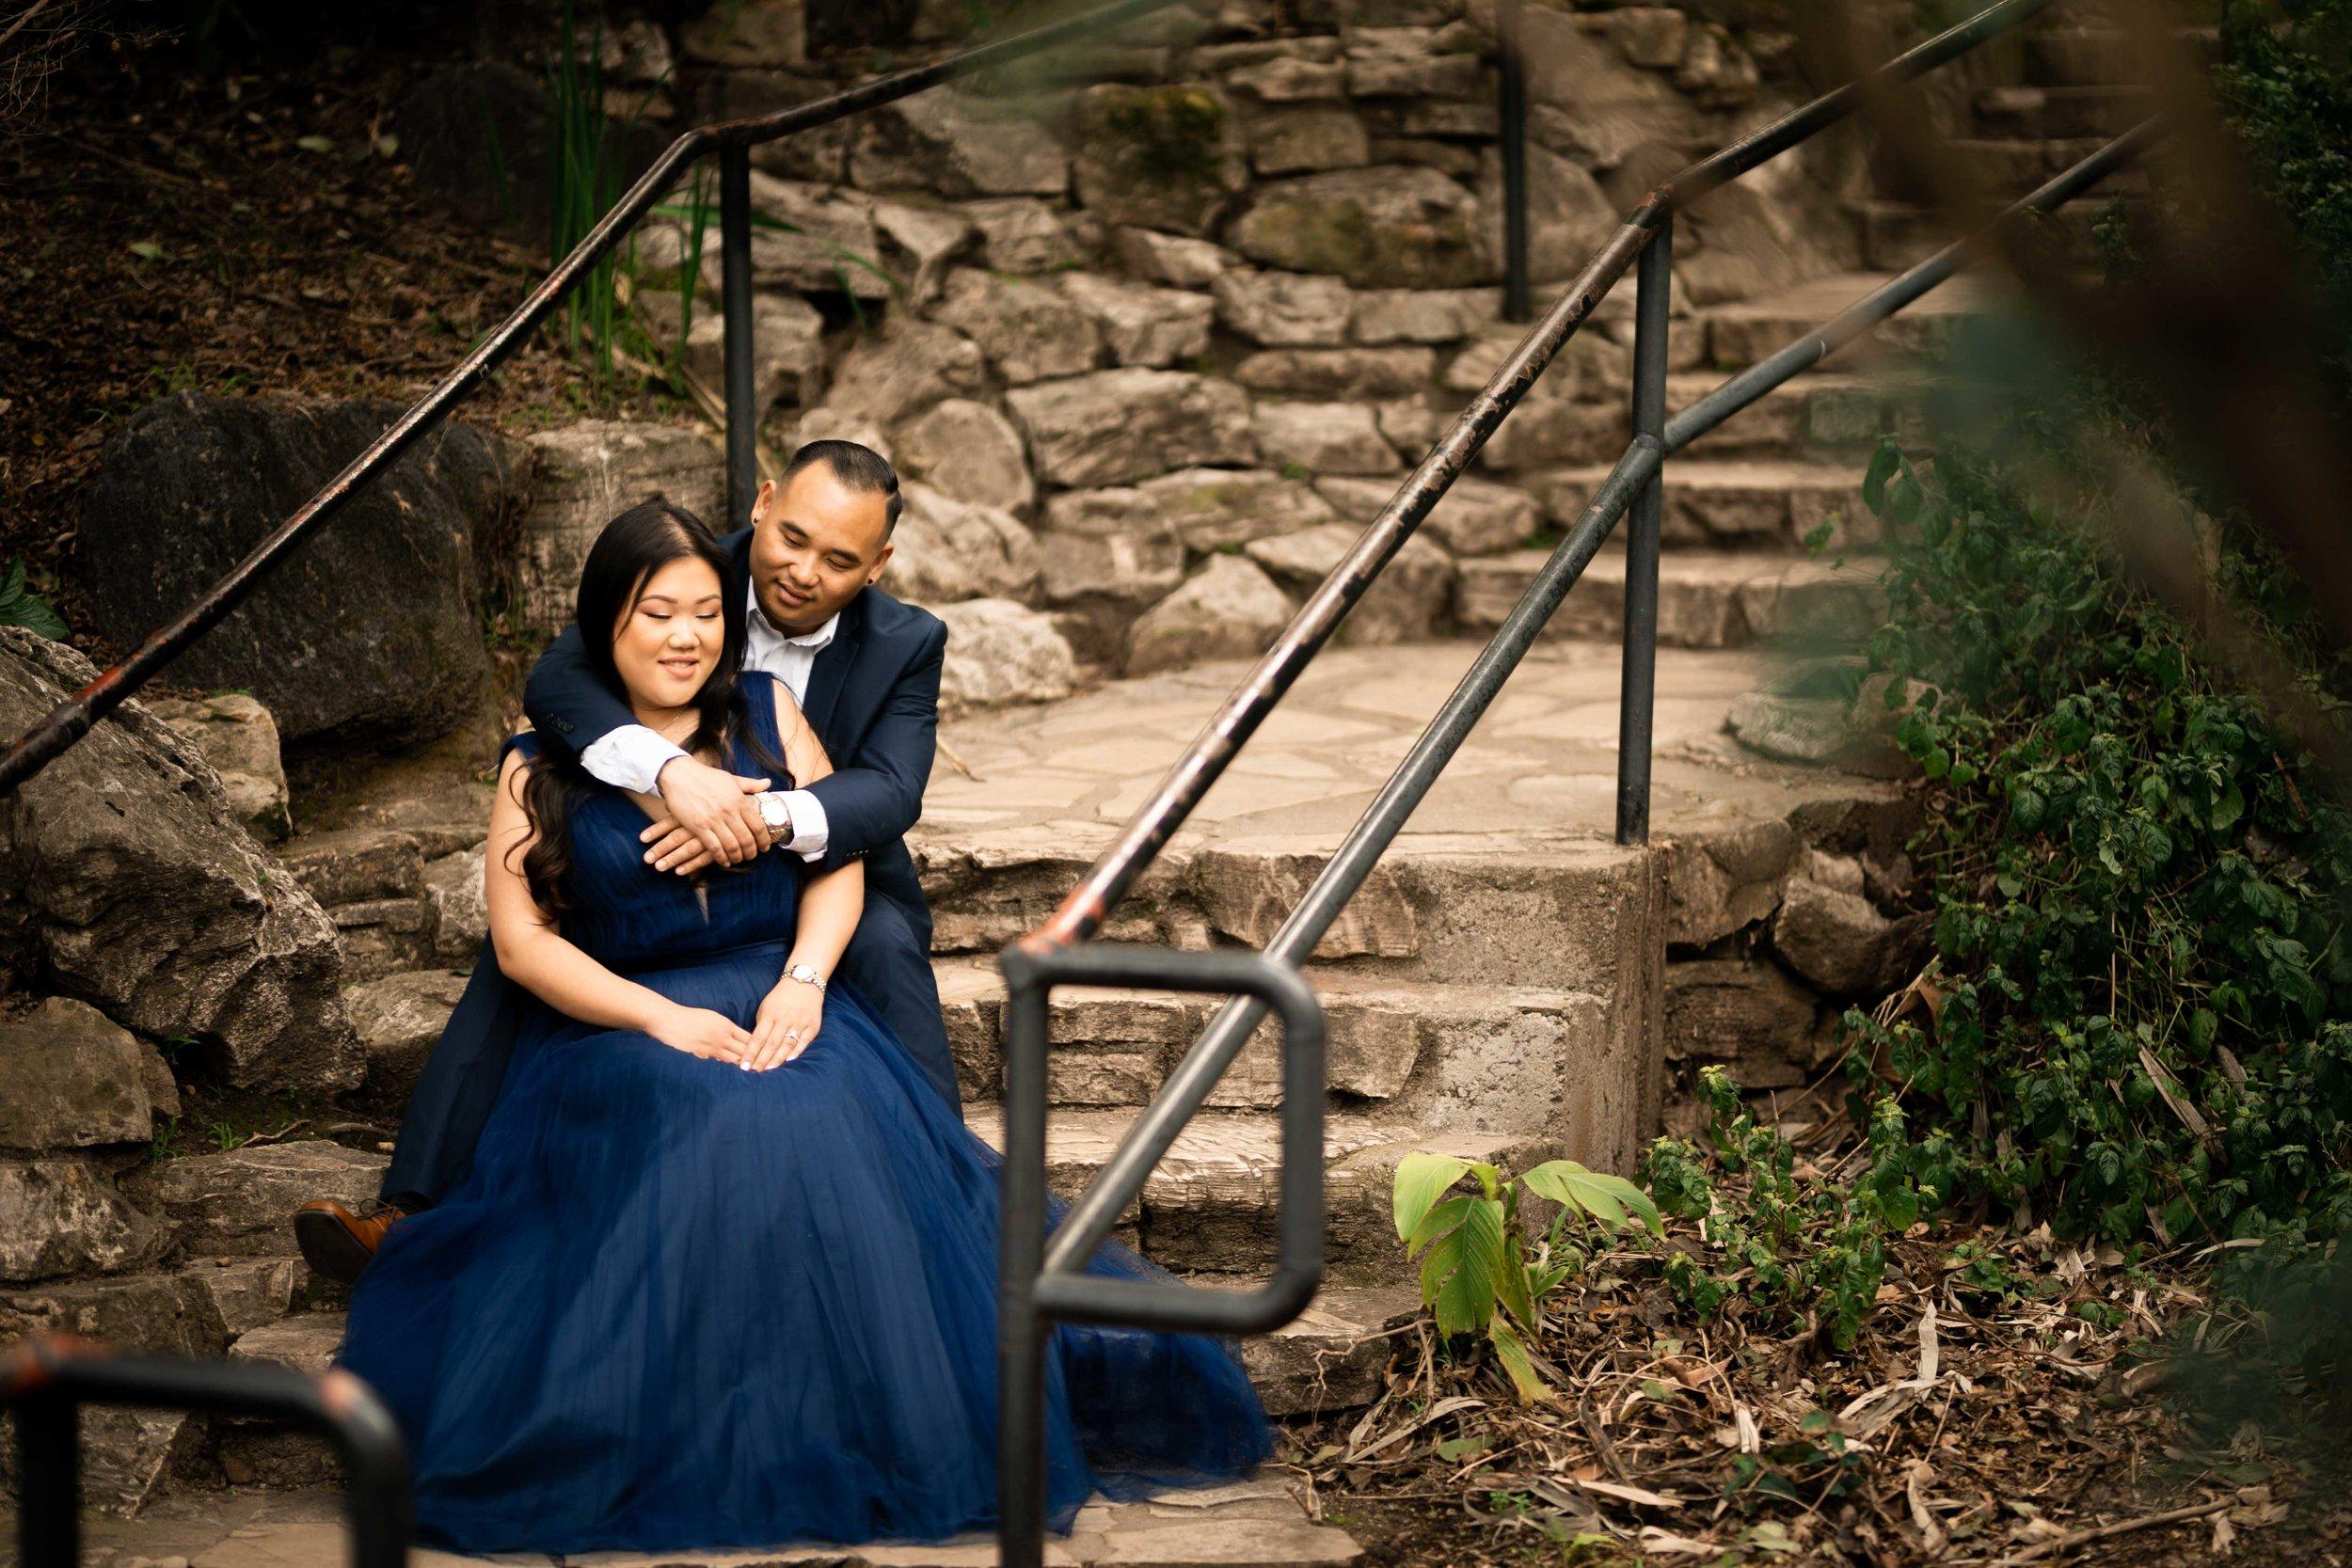 los_angeles_arboretum_engagement_joshuachun_photography_-10.JPG